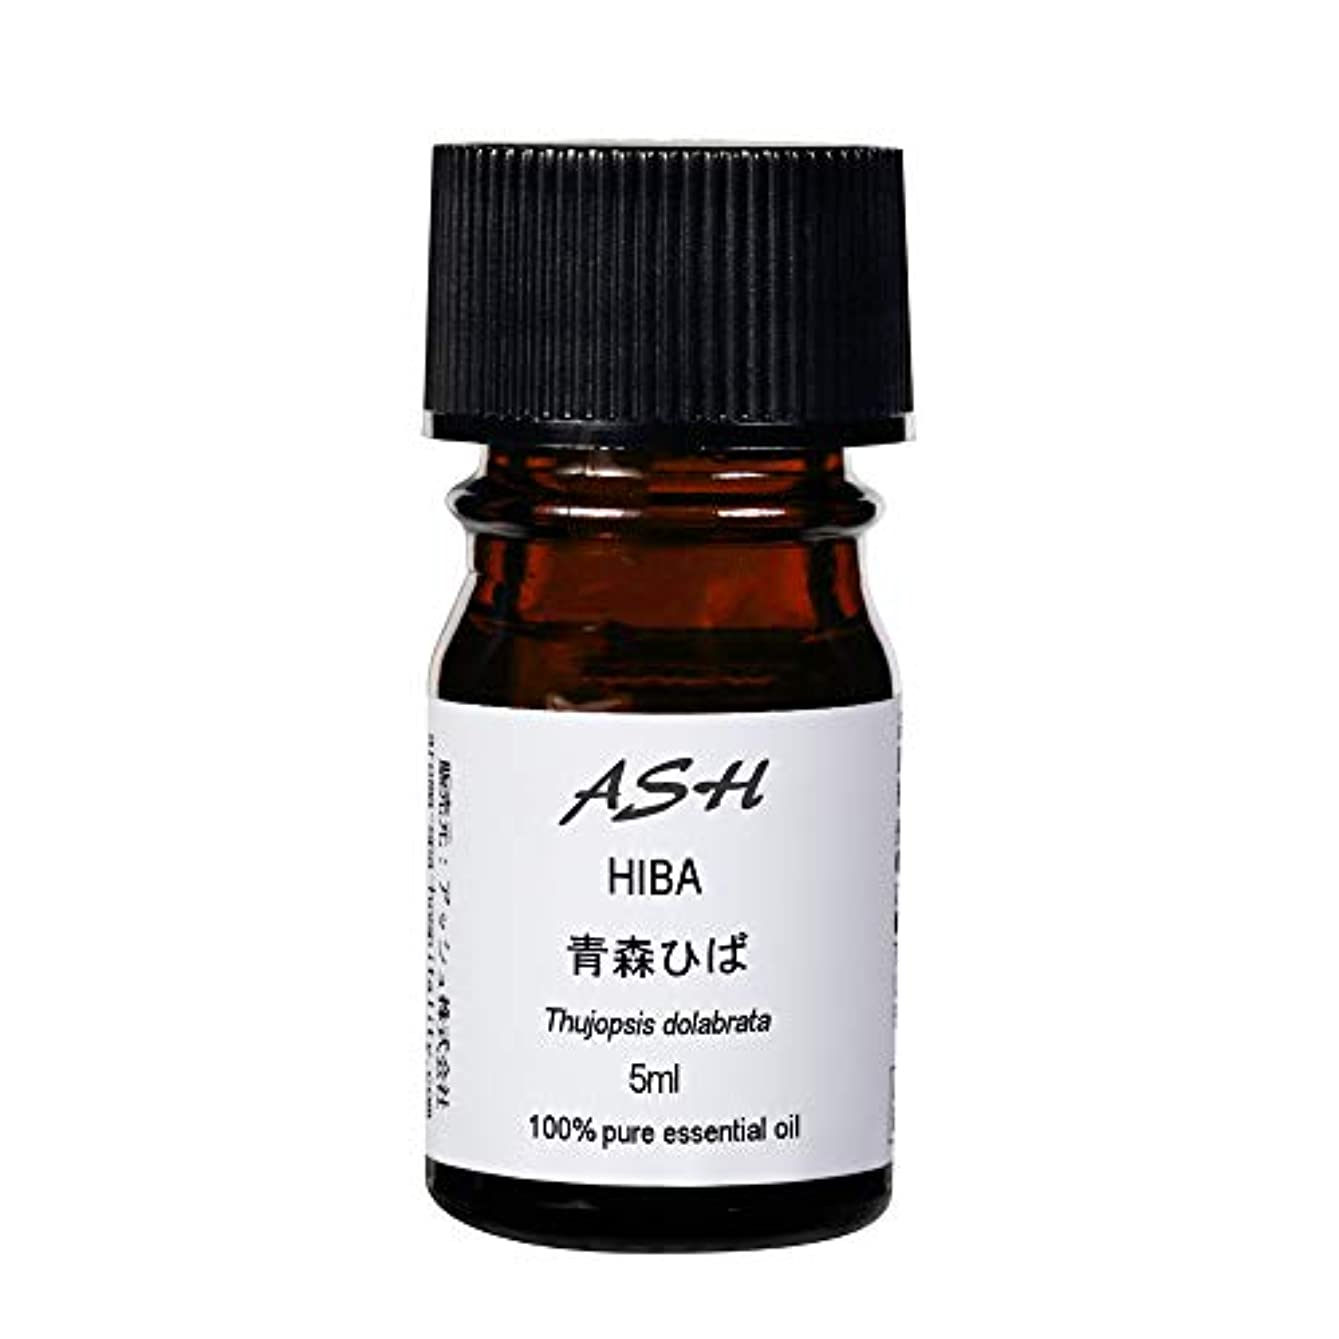 ASH 青森ひば エッセンシャルオイル 5ml AEAJ表示基準適合認定精油 和精油